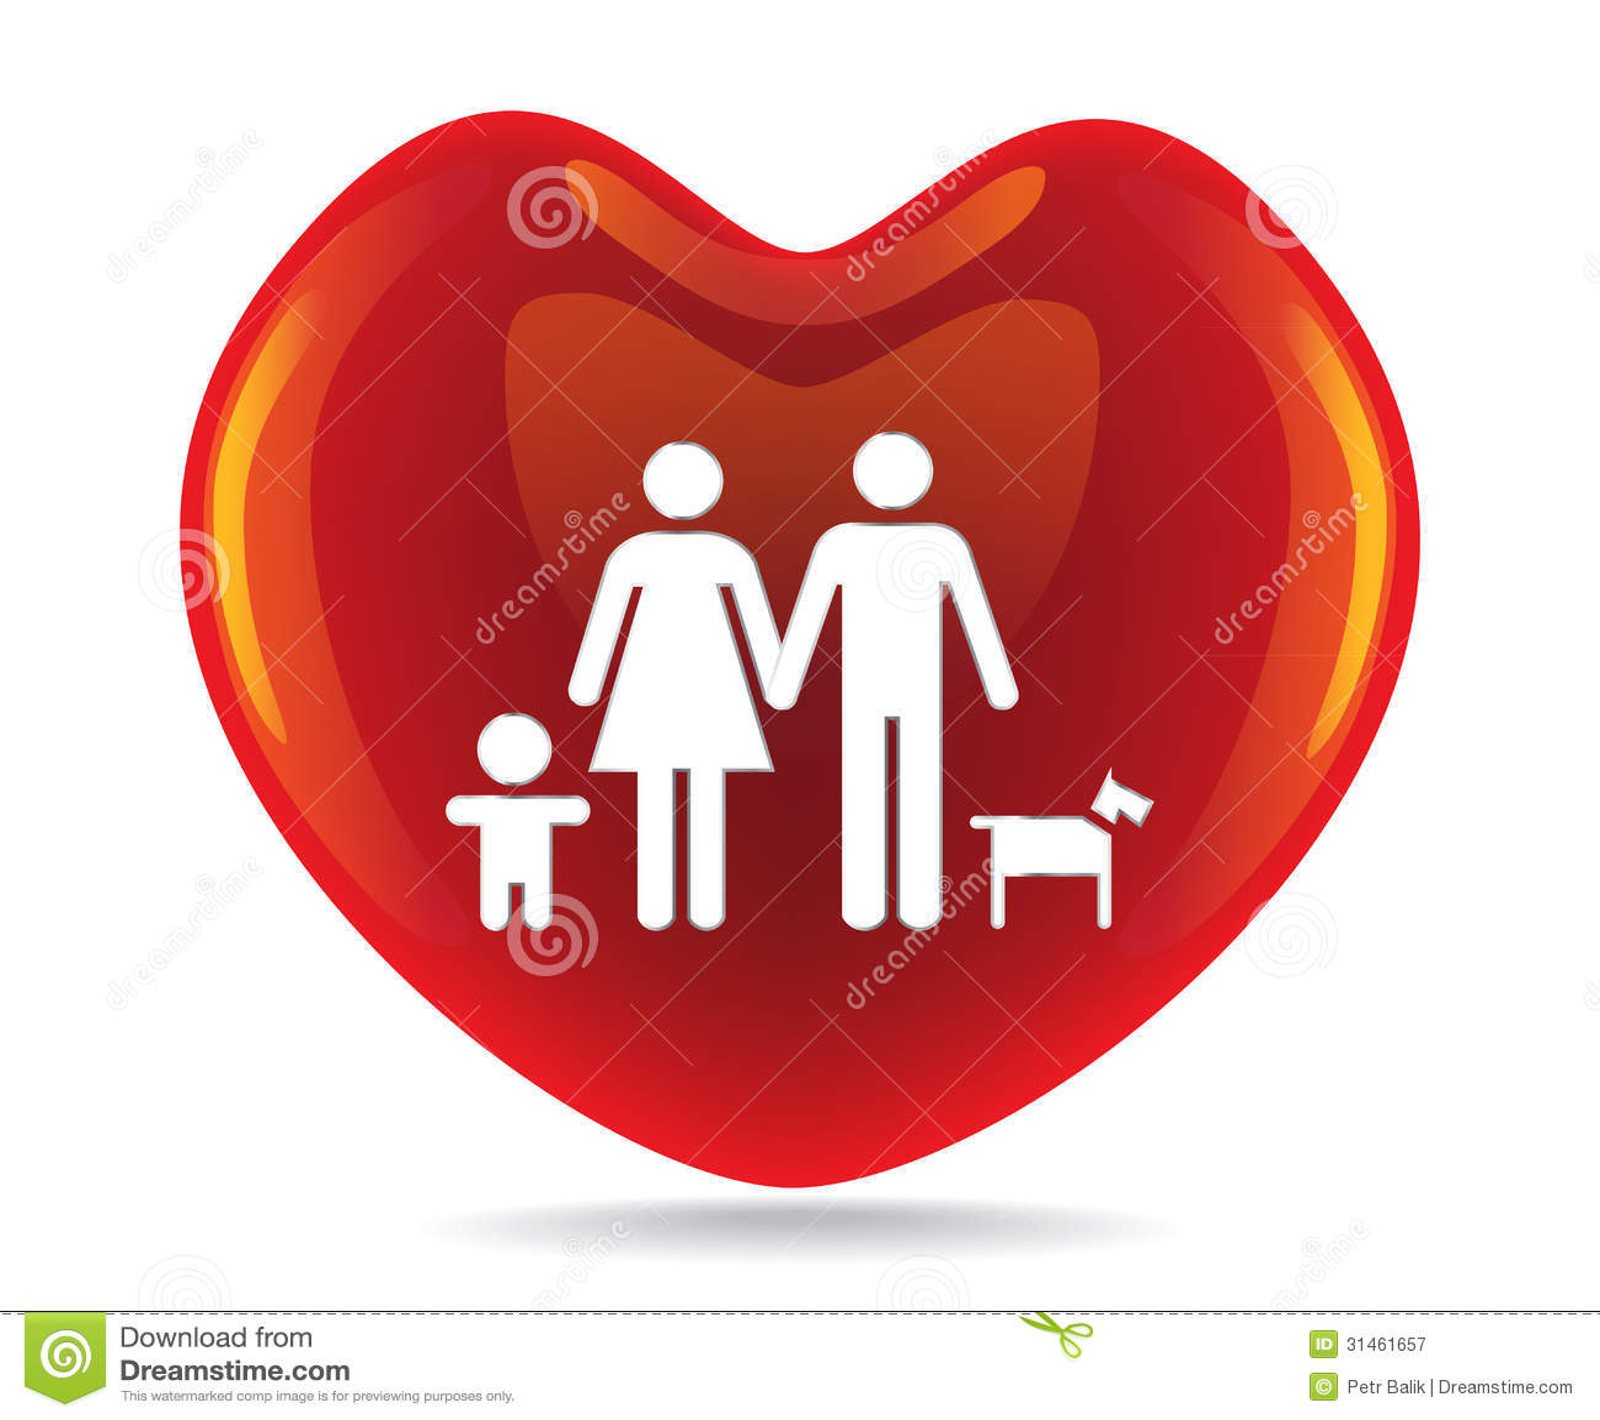 A basic family in big heart stock illustration illustration royalty free stock photo buycottarizona Image collections